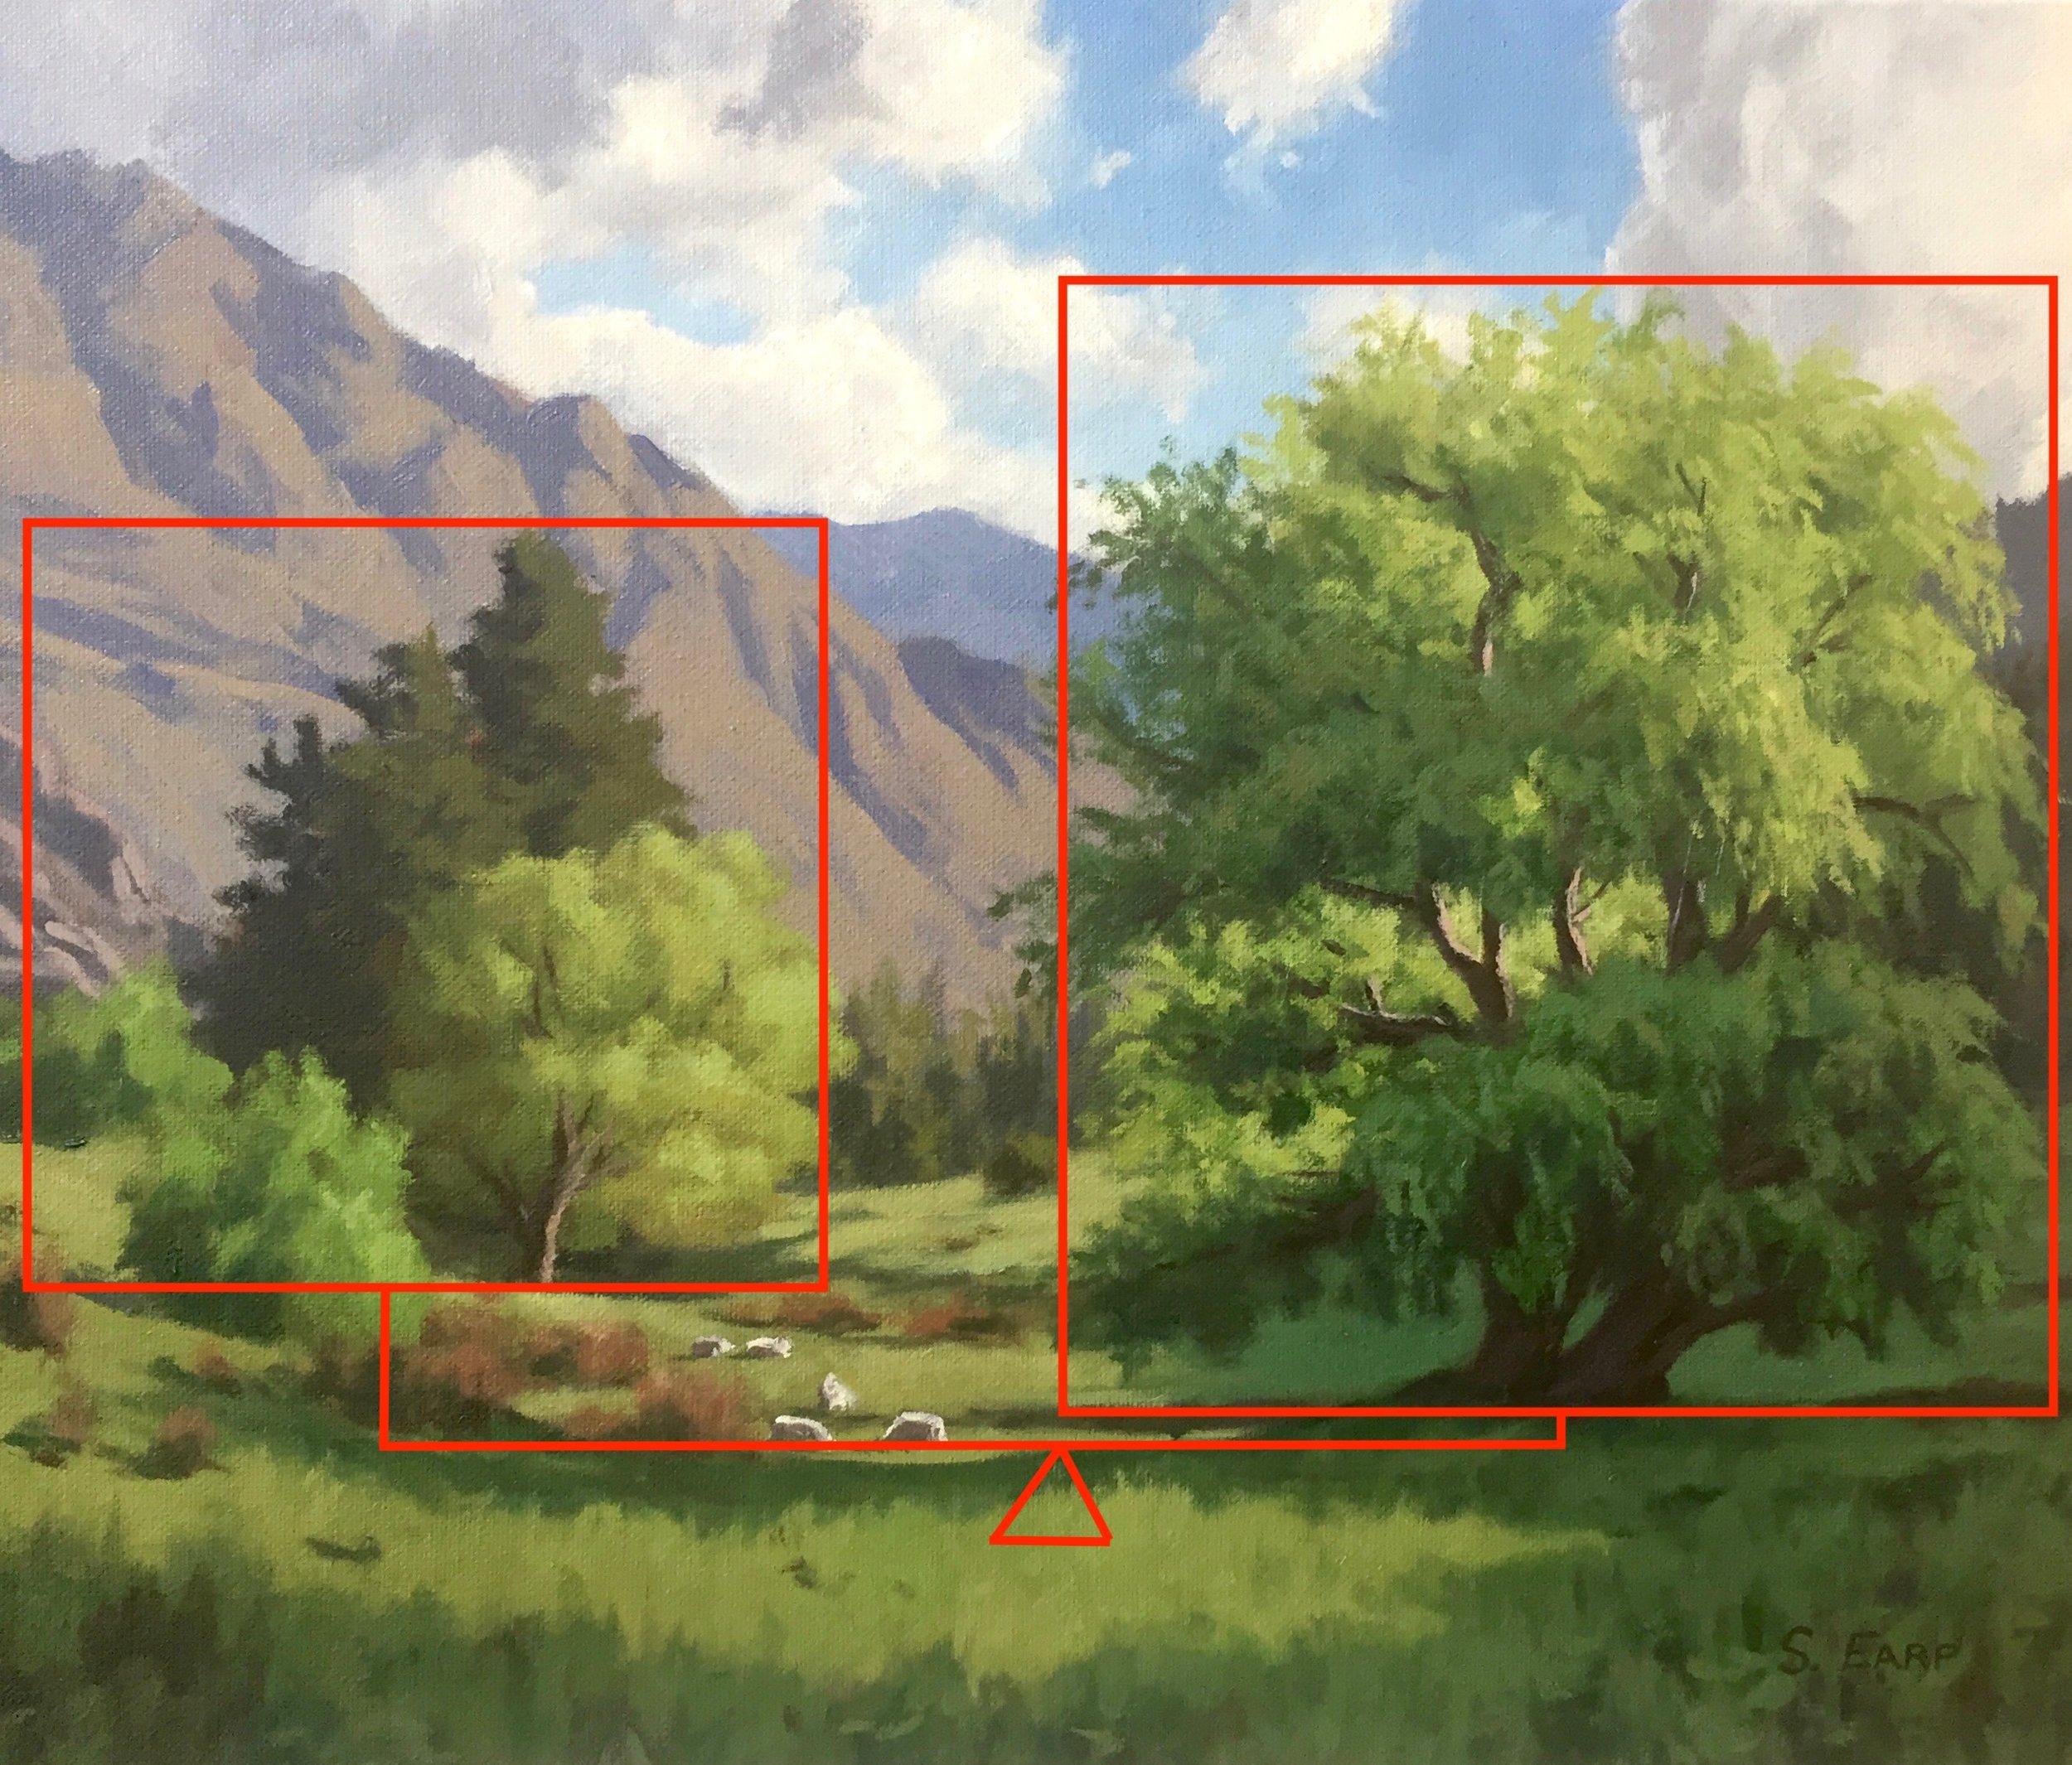 Willow Trees and Light - Samuel Earp - oil painting - composition 3.jpg